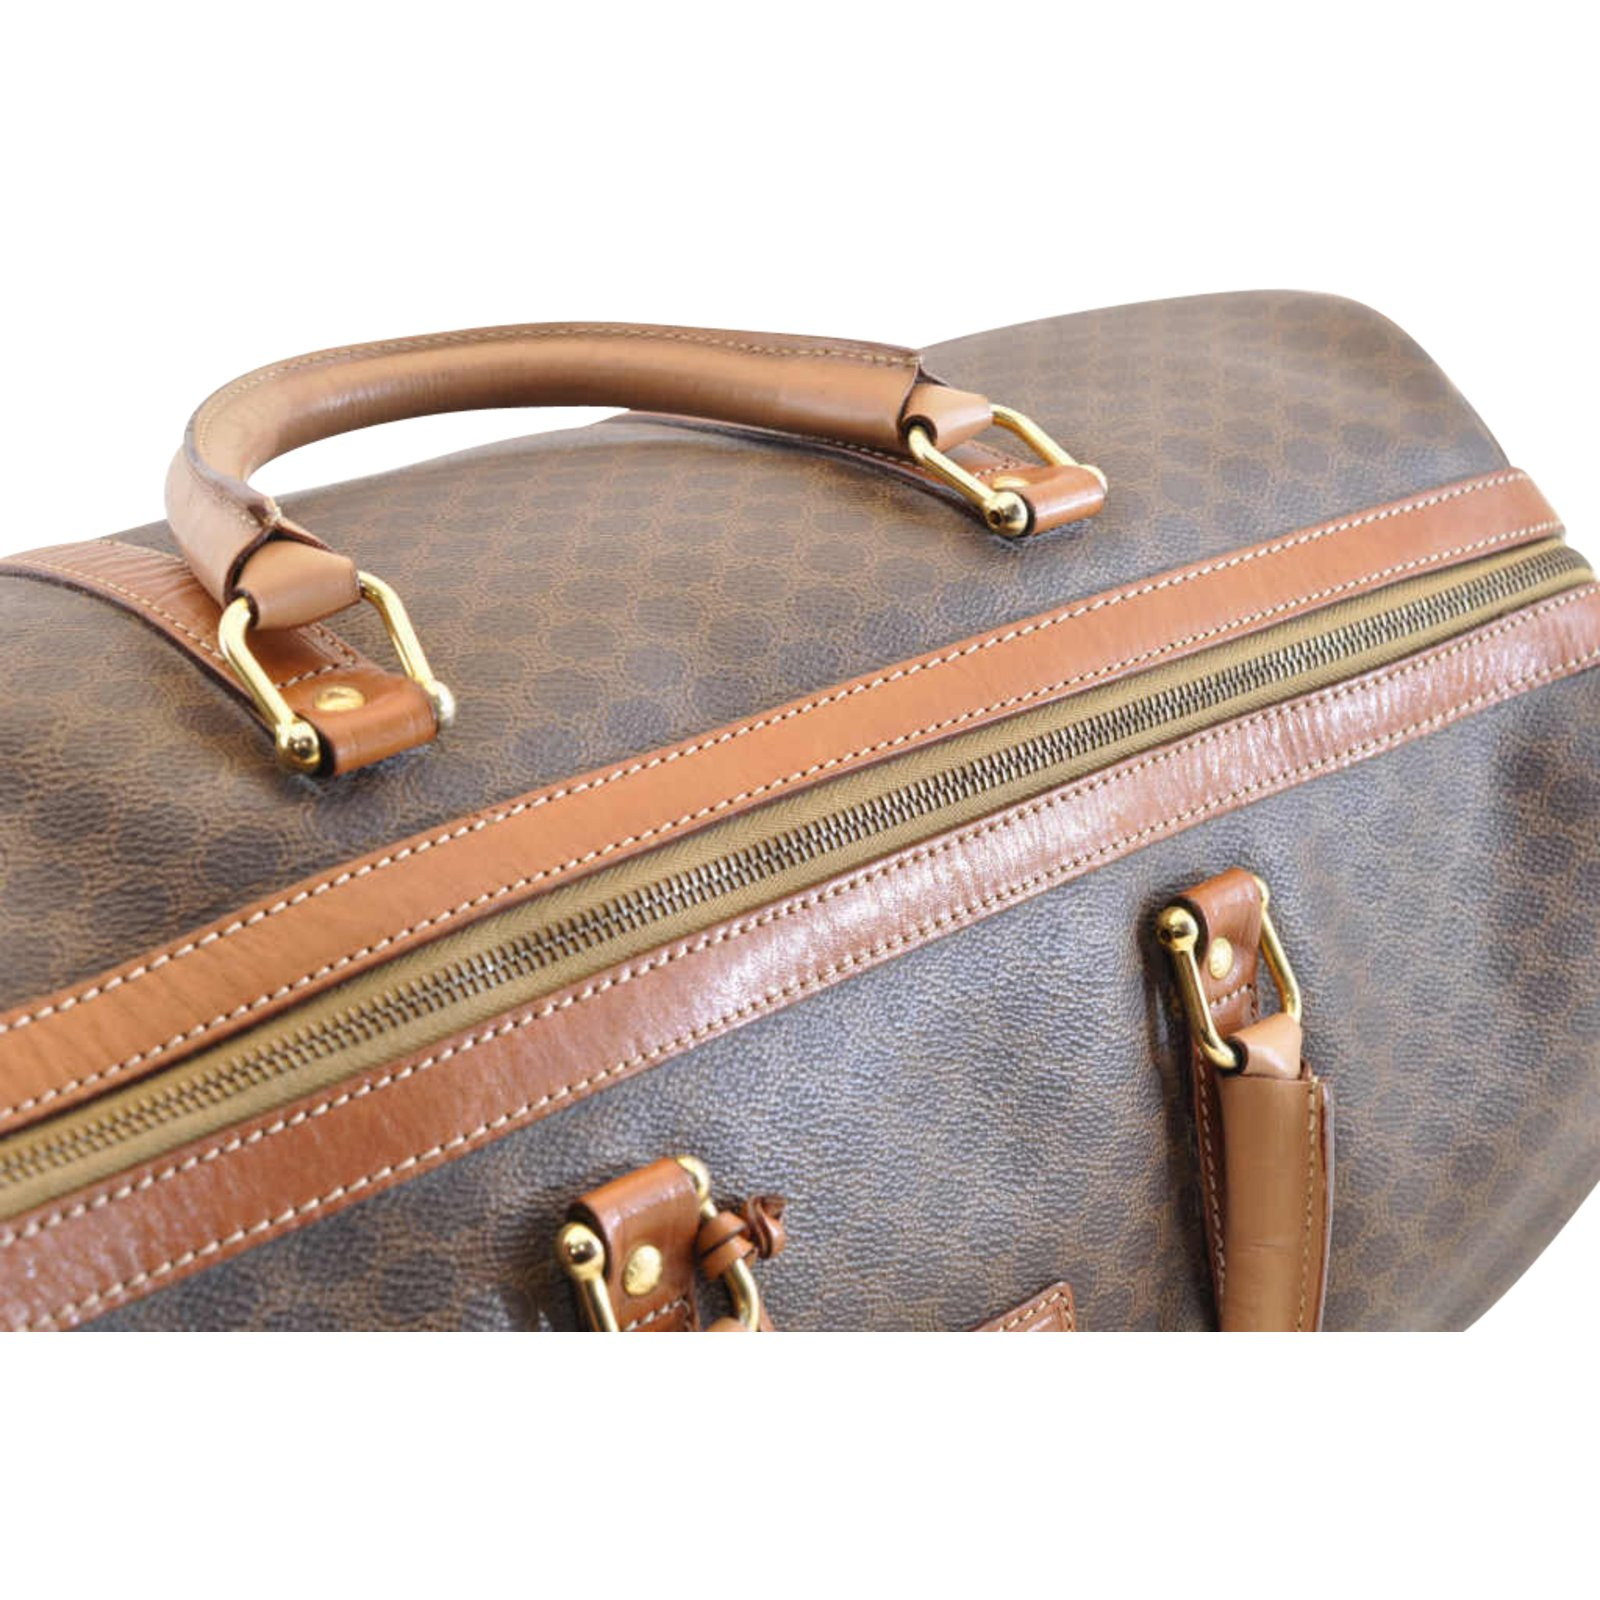 e8f10b829554 Facebook · Pin This. Céline Celine Boston Bag Handbags Other Brown ref. 104304